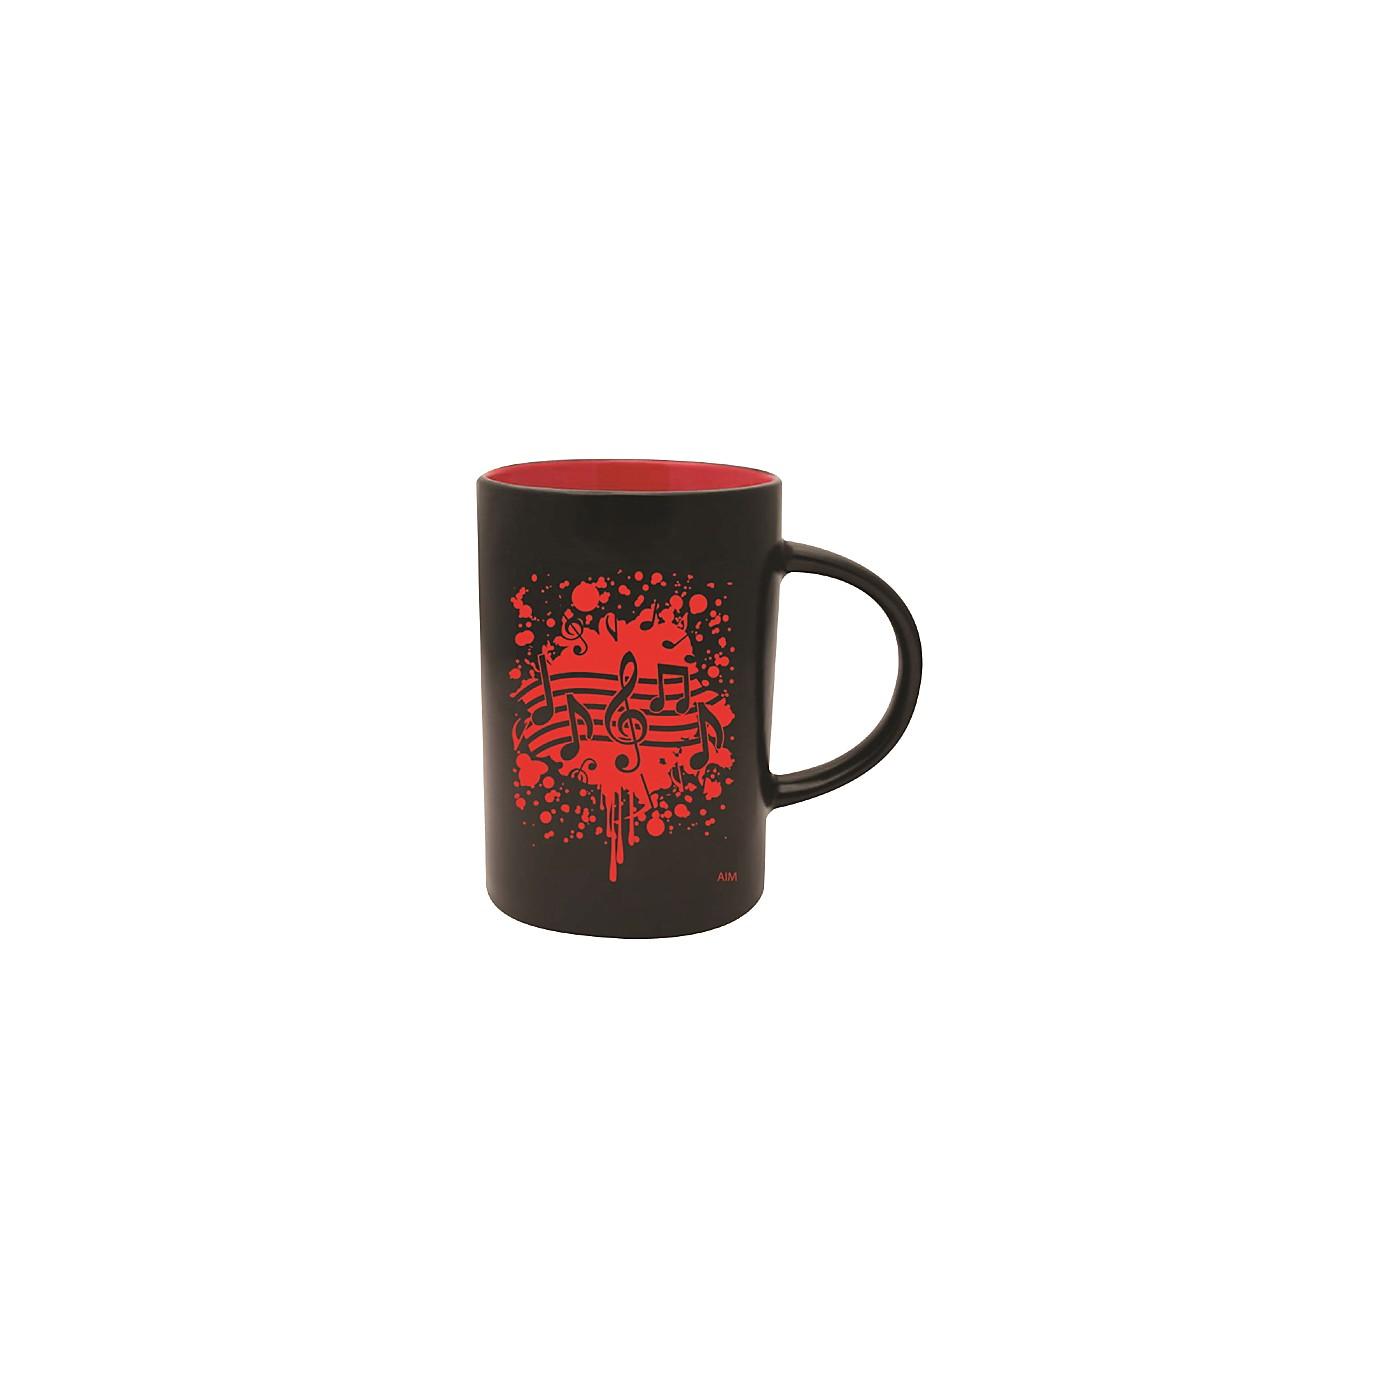 AIM Musical Note Burst Black/Red Coffee Mug thumbnail